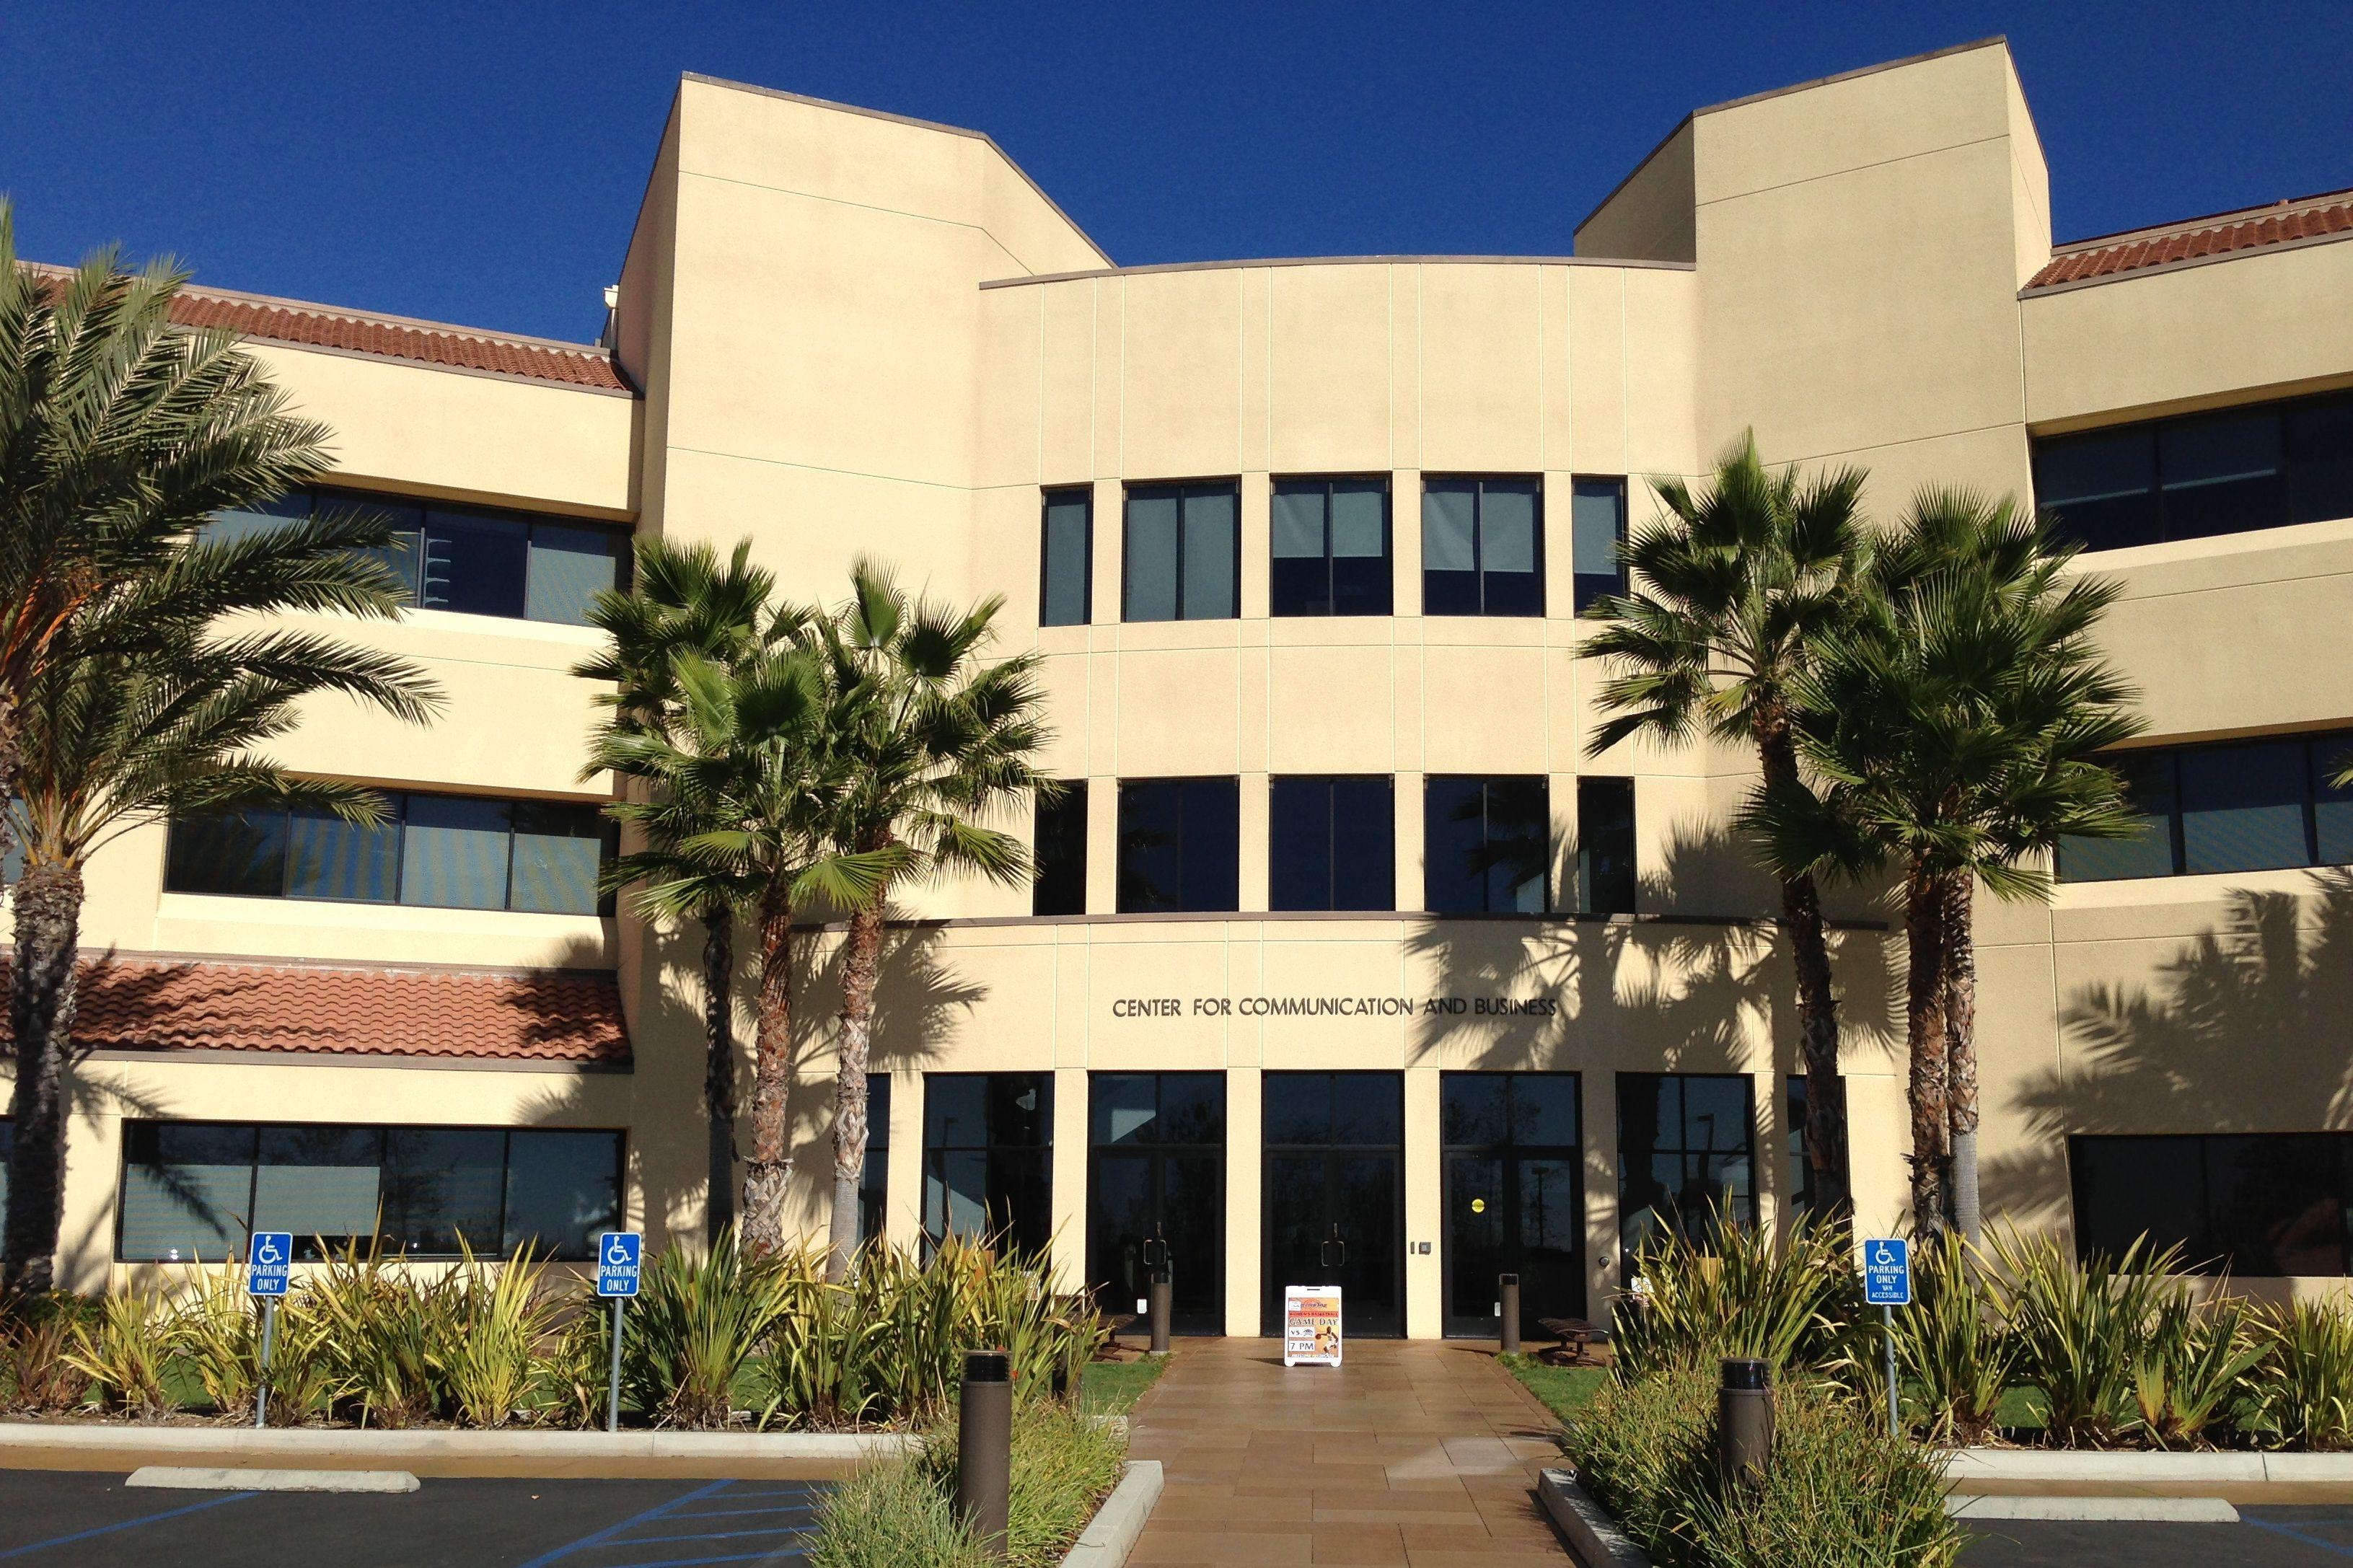 Center for Communication and Business at Pepperdine University